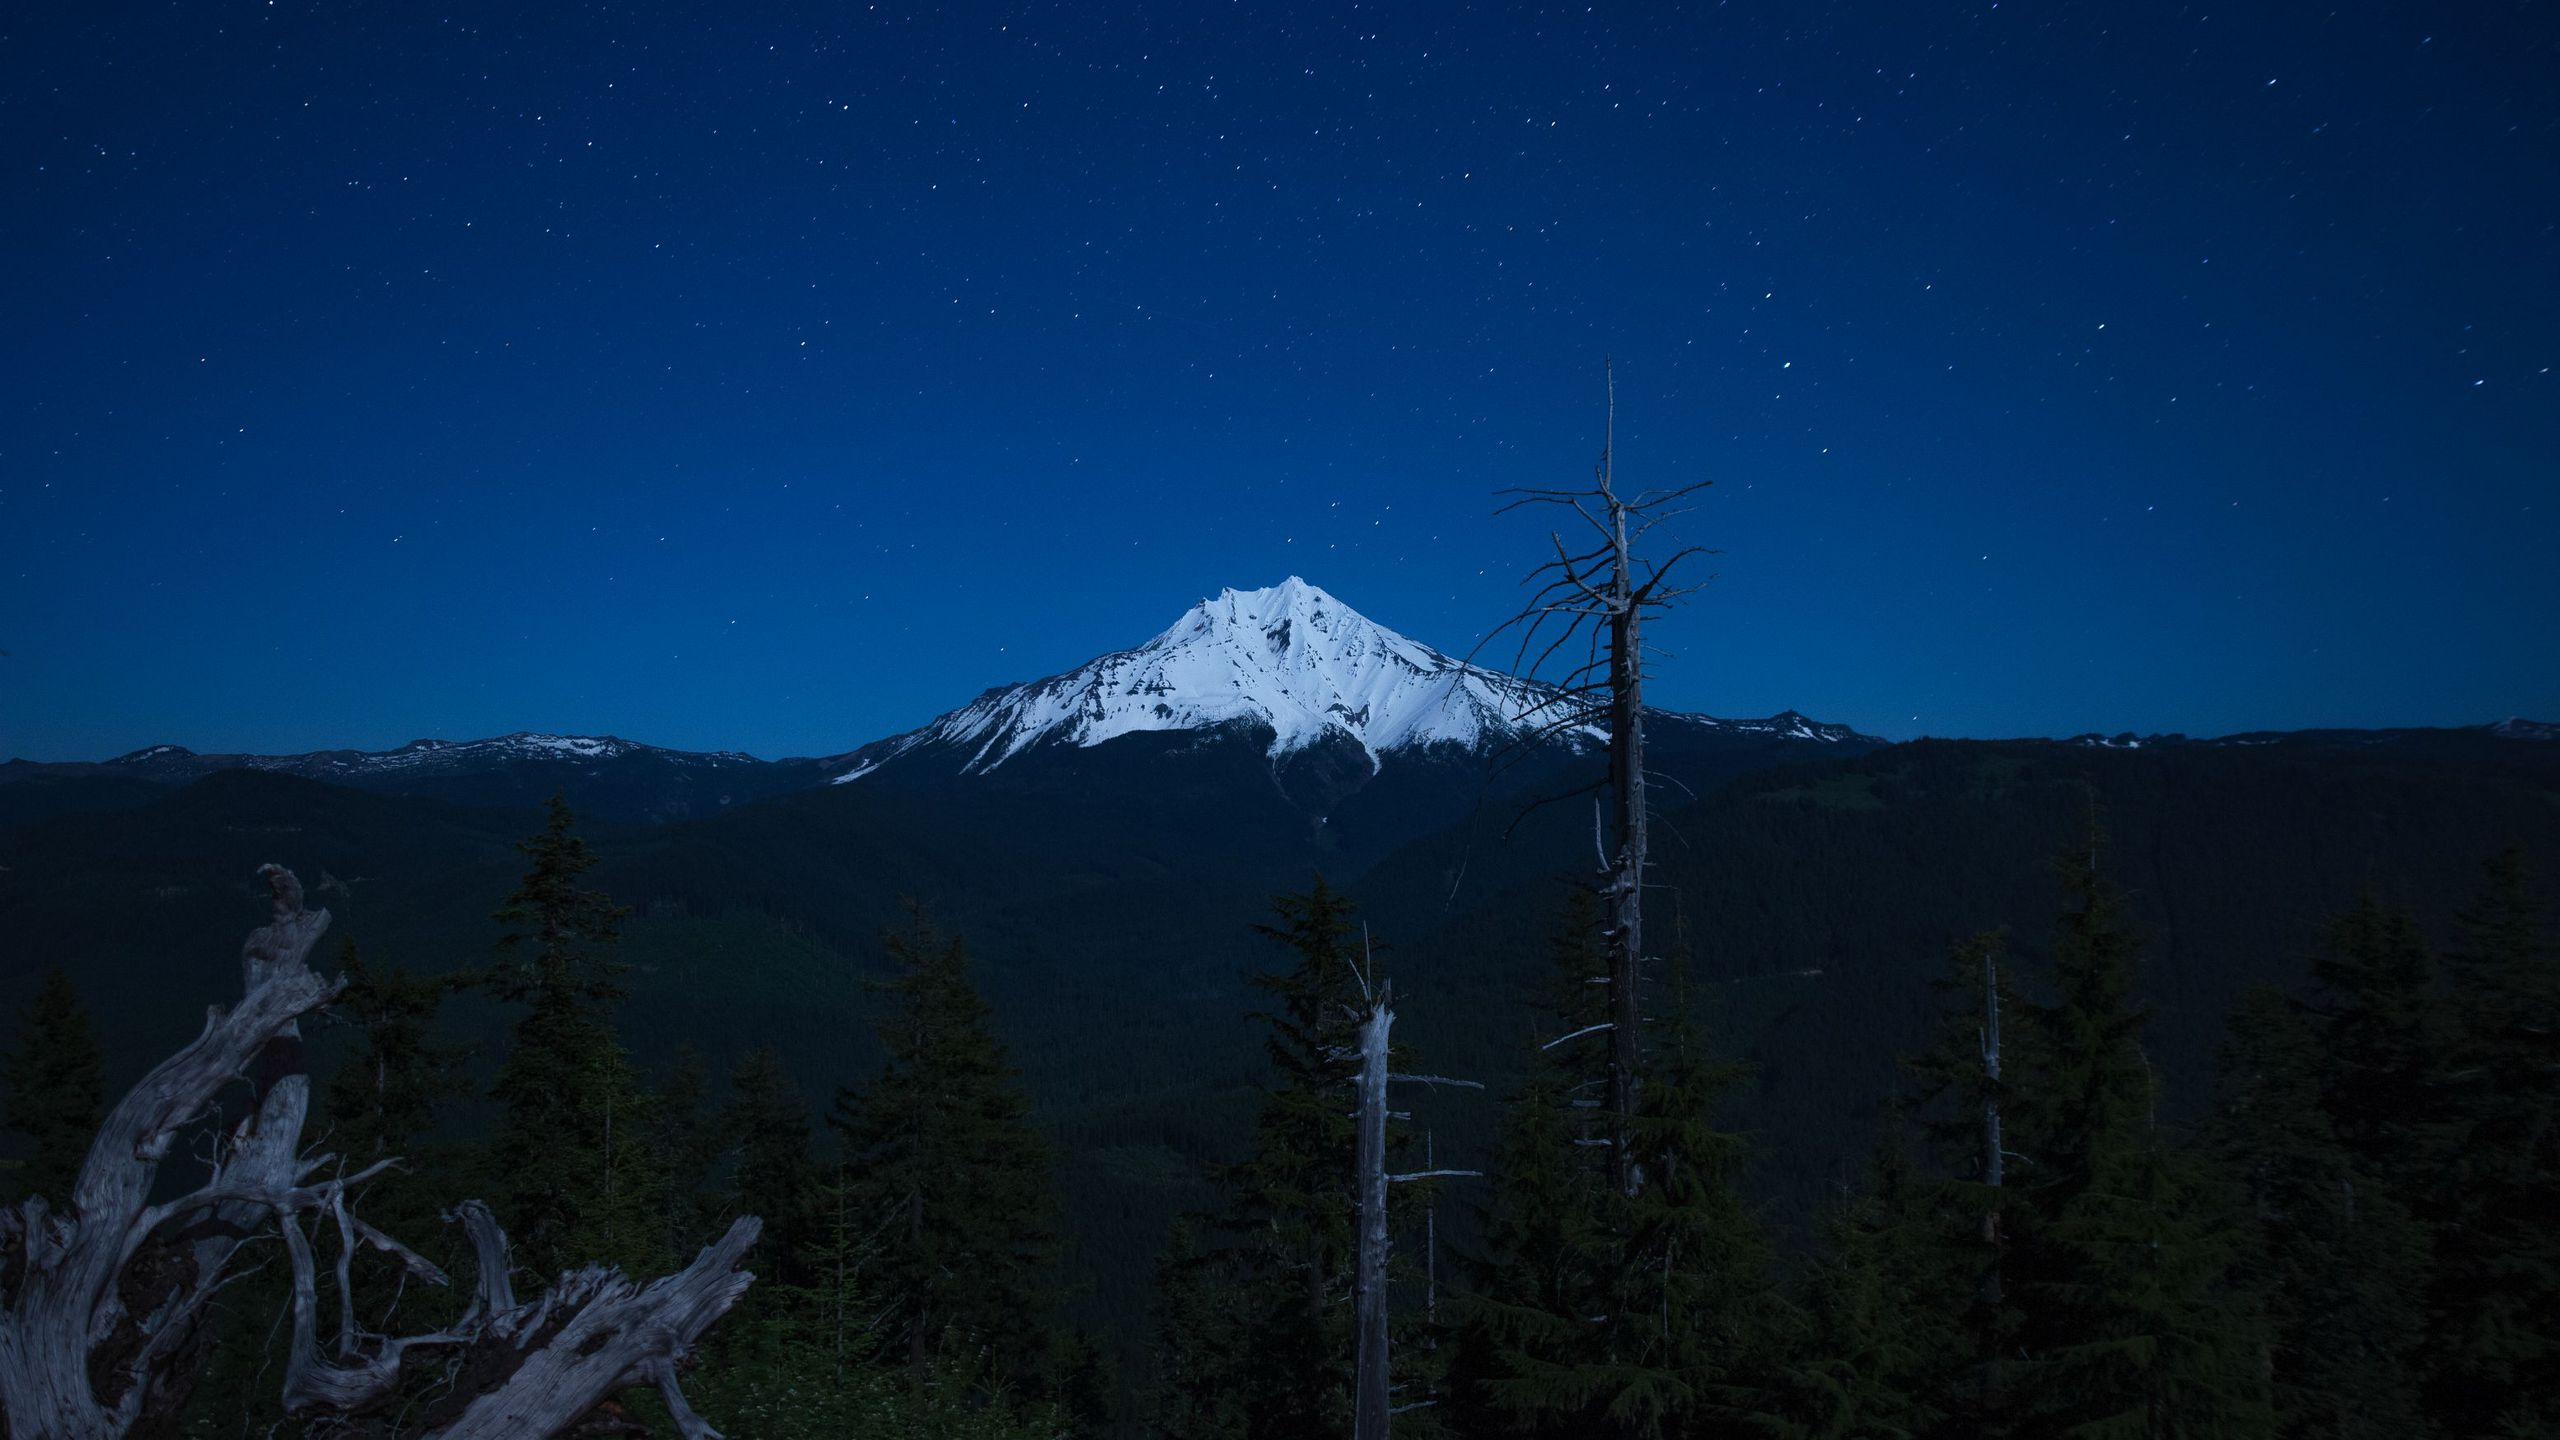 BOTPOST [BOTPOST] Mt Jefferson Oregon iimgurcom 2560x1440